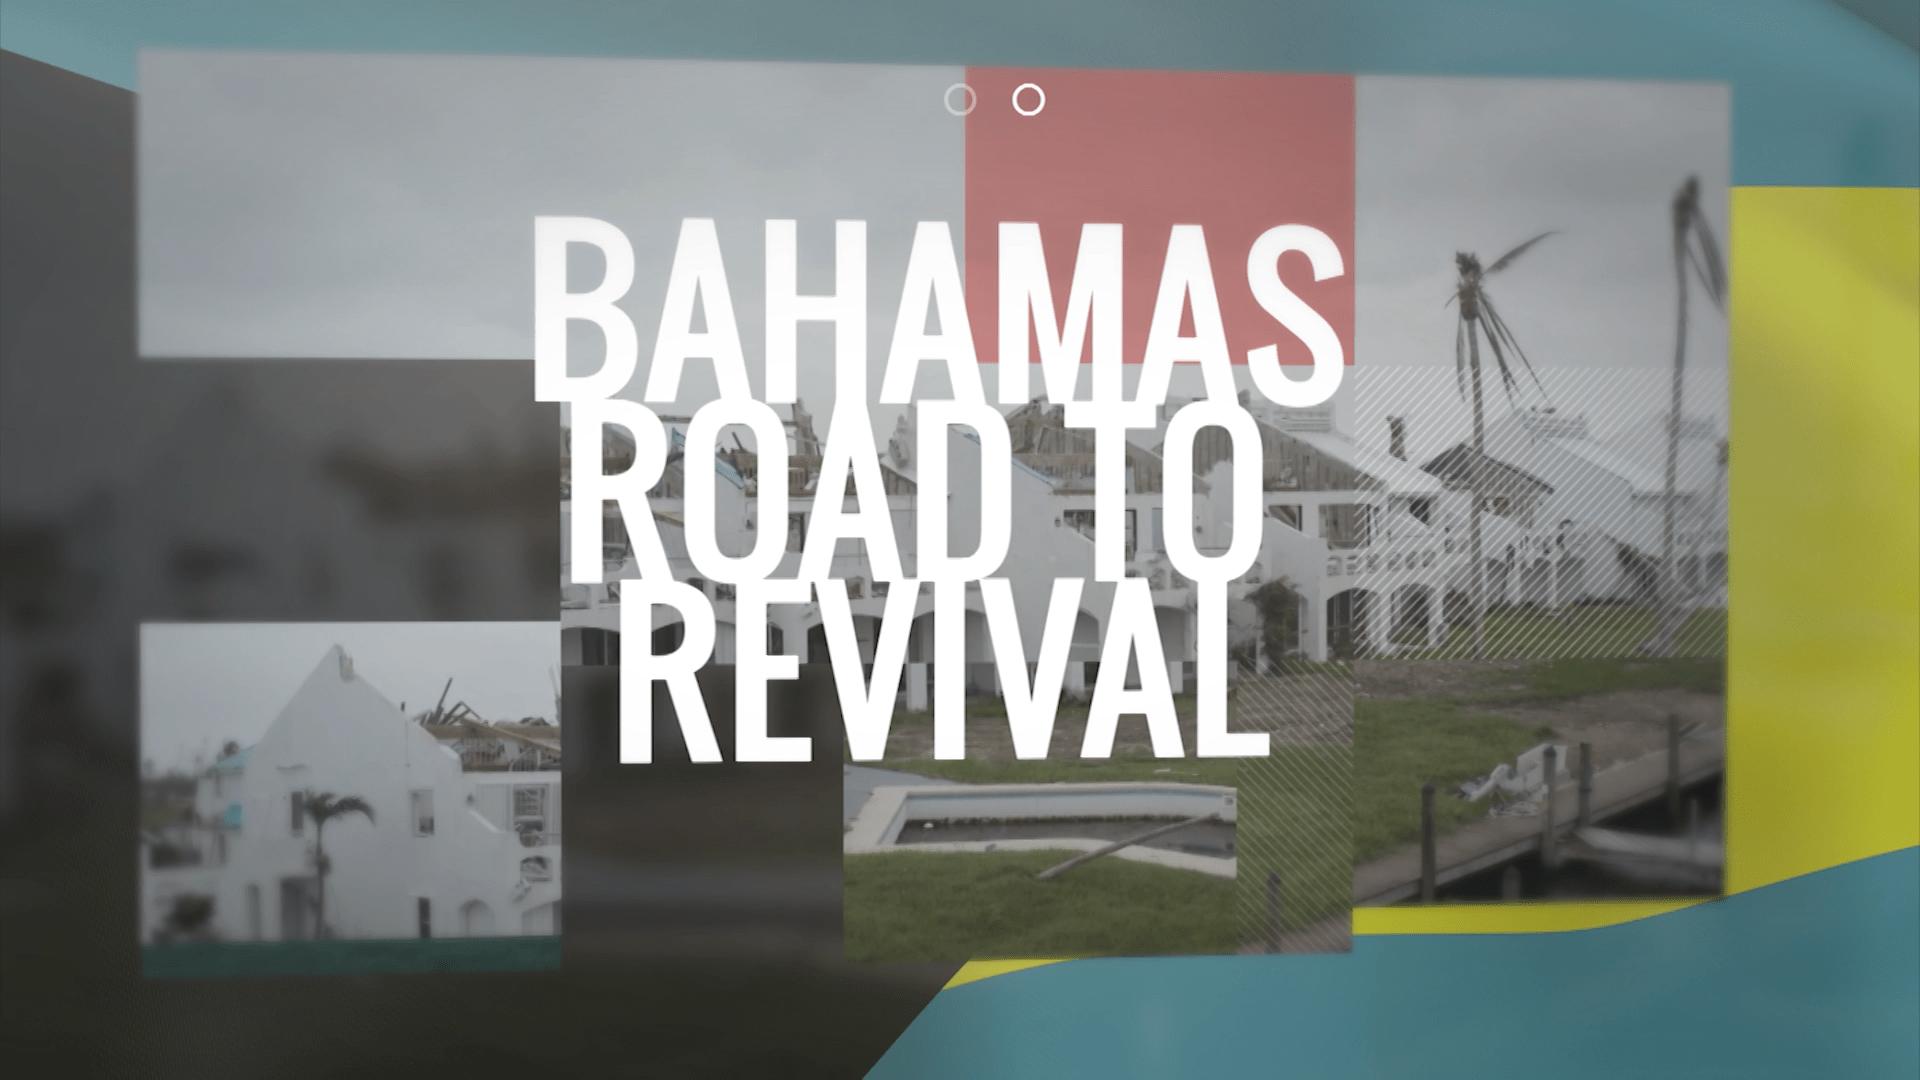 One Caribbean TV Special Examines Hurricane Recovery in Bahamas